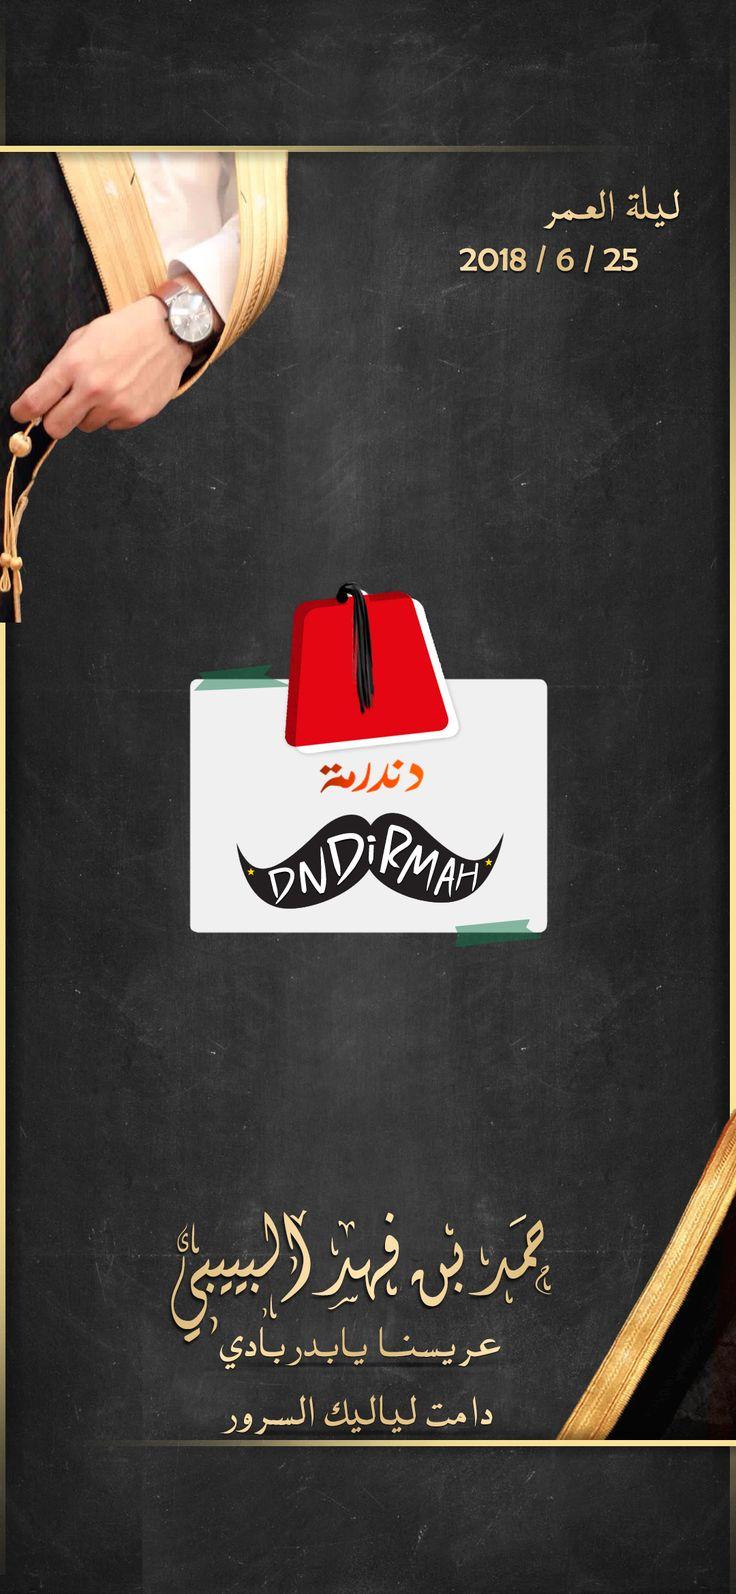 فلتر زواج فلتر سناب شات من تصميم دندرمة Company Logo Tech Company Logos Flower Frame